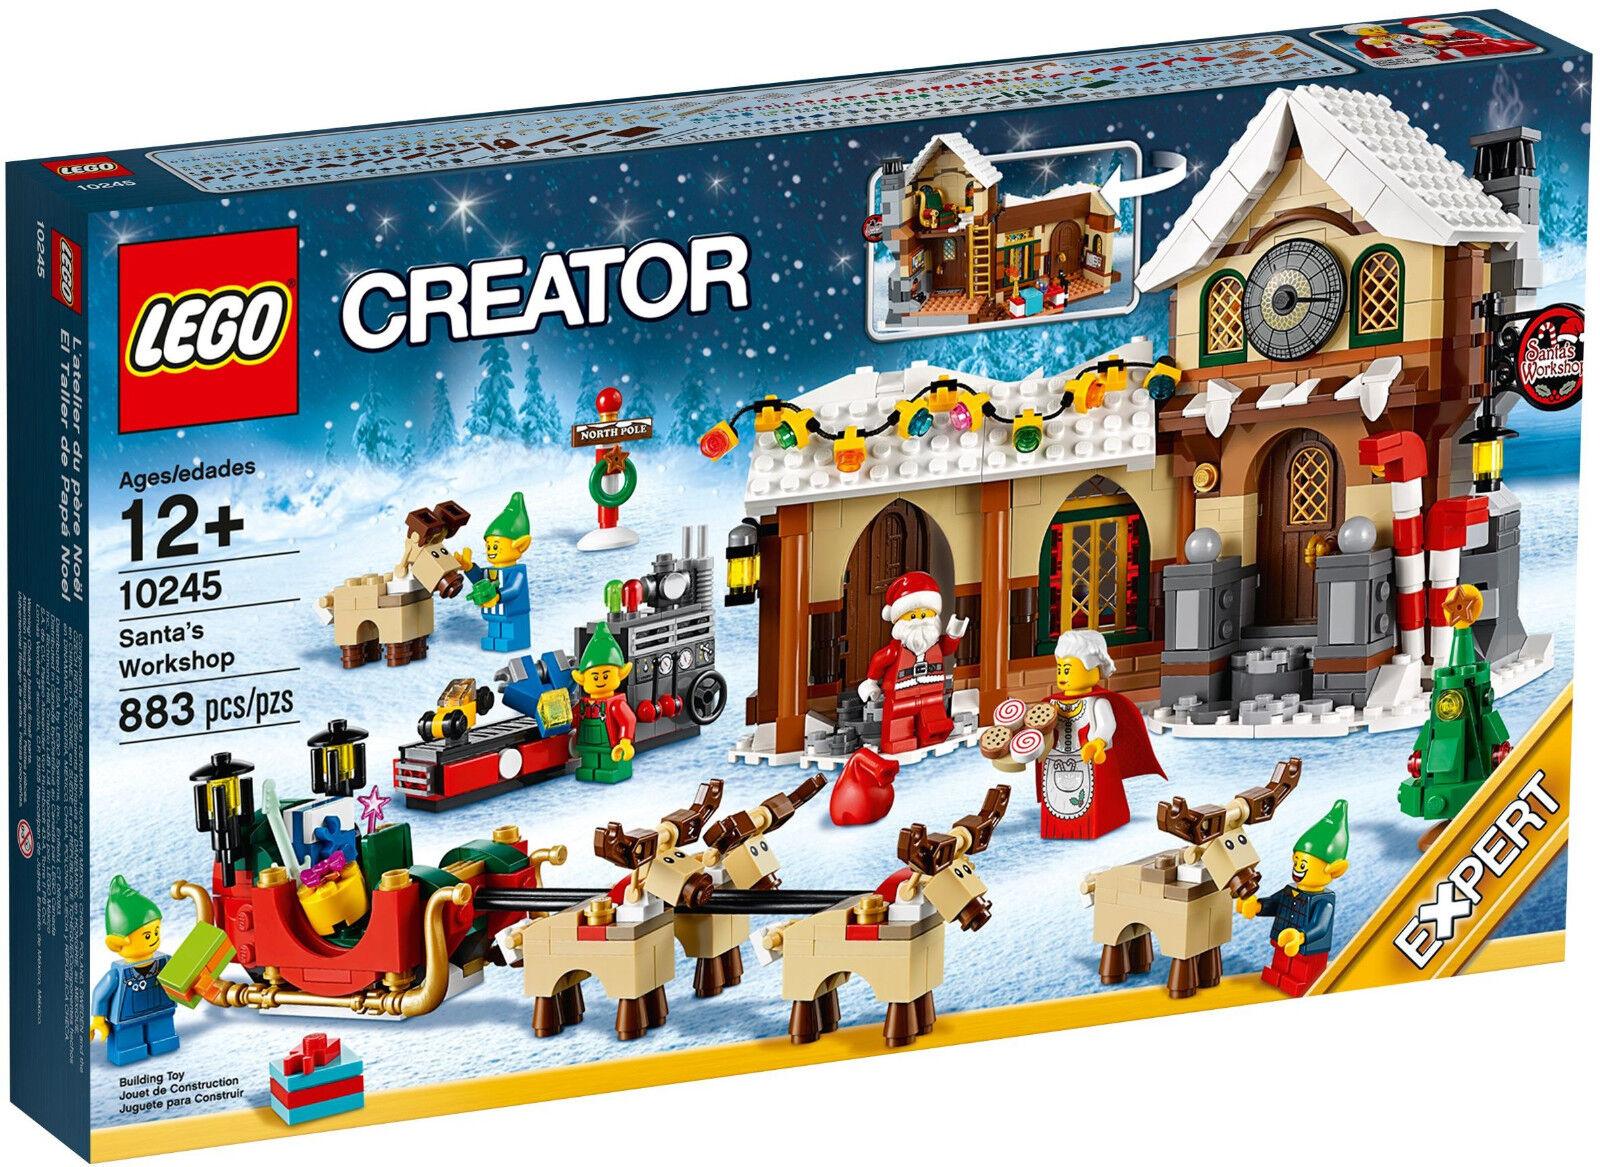 RETIRED 2014 LEGO CREATOR SEASONAL CHRISTMAS SANTA'S WORKSHOP 10245, NEW&SEALED